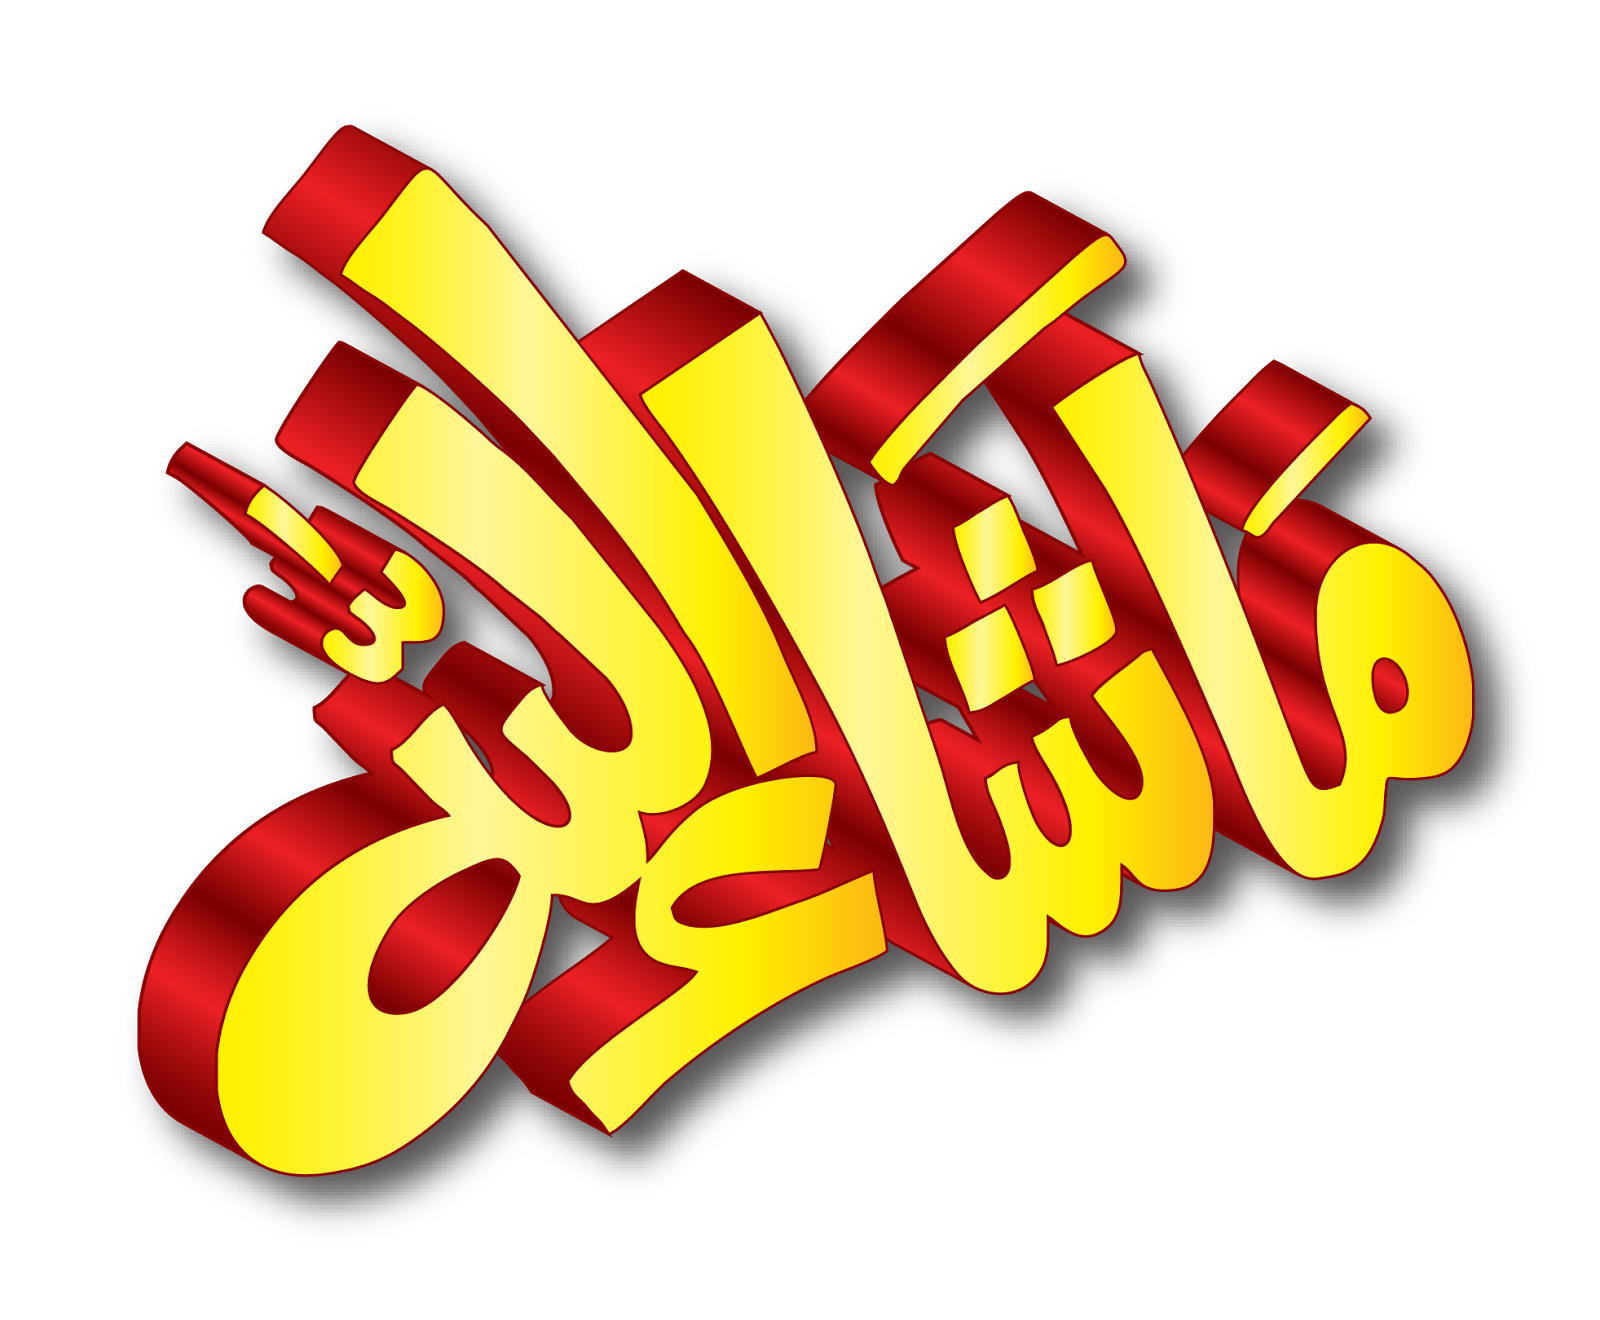 Kashif mir designs for. E clipart designer